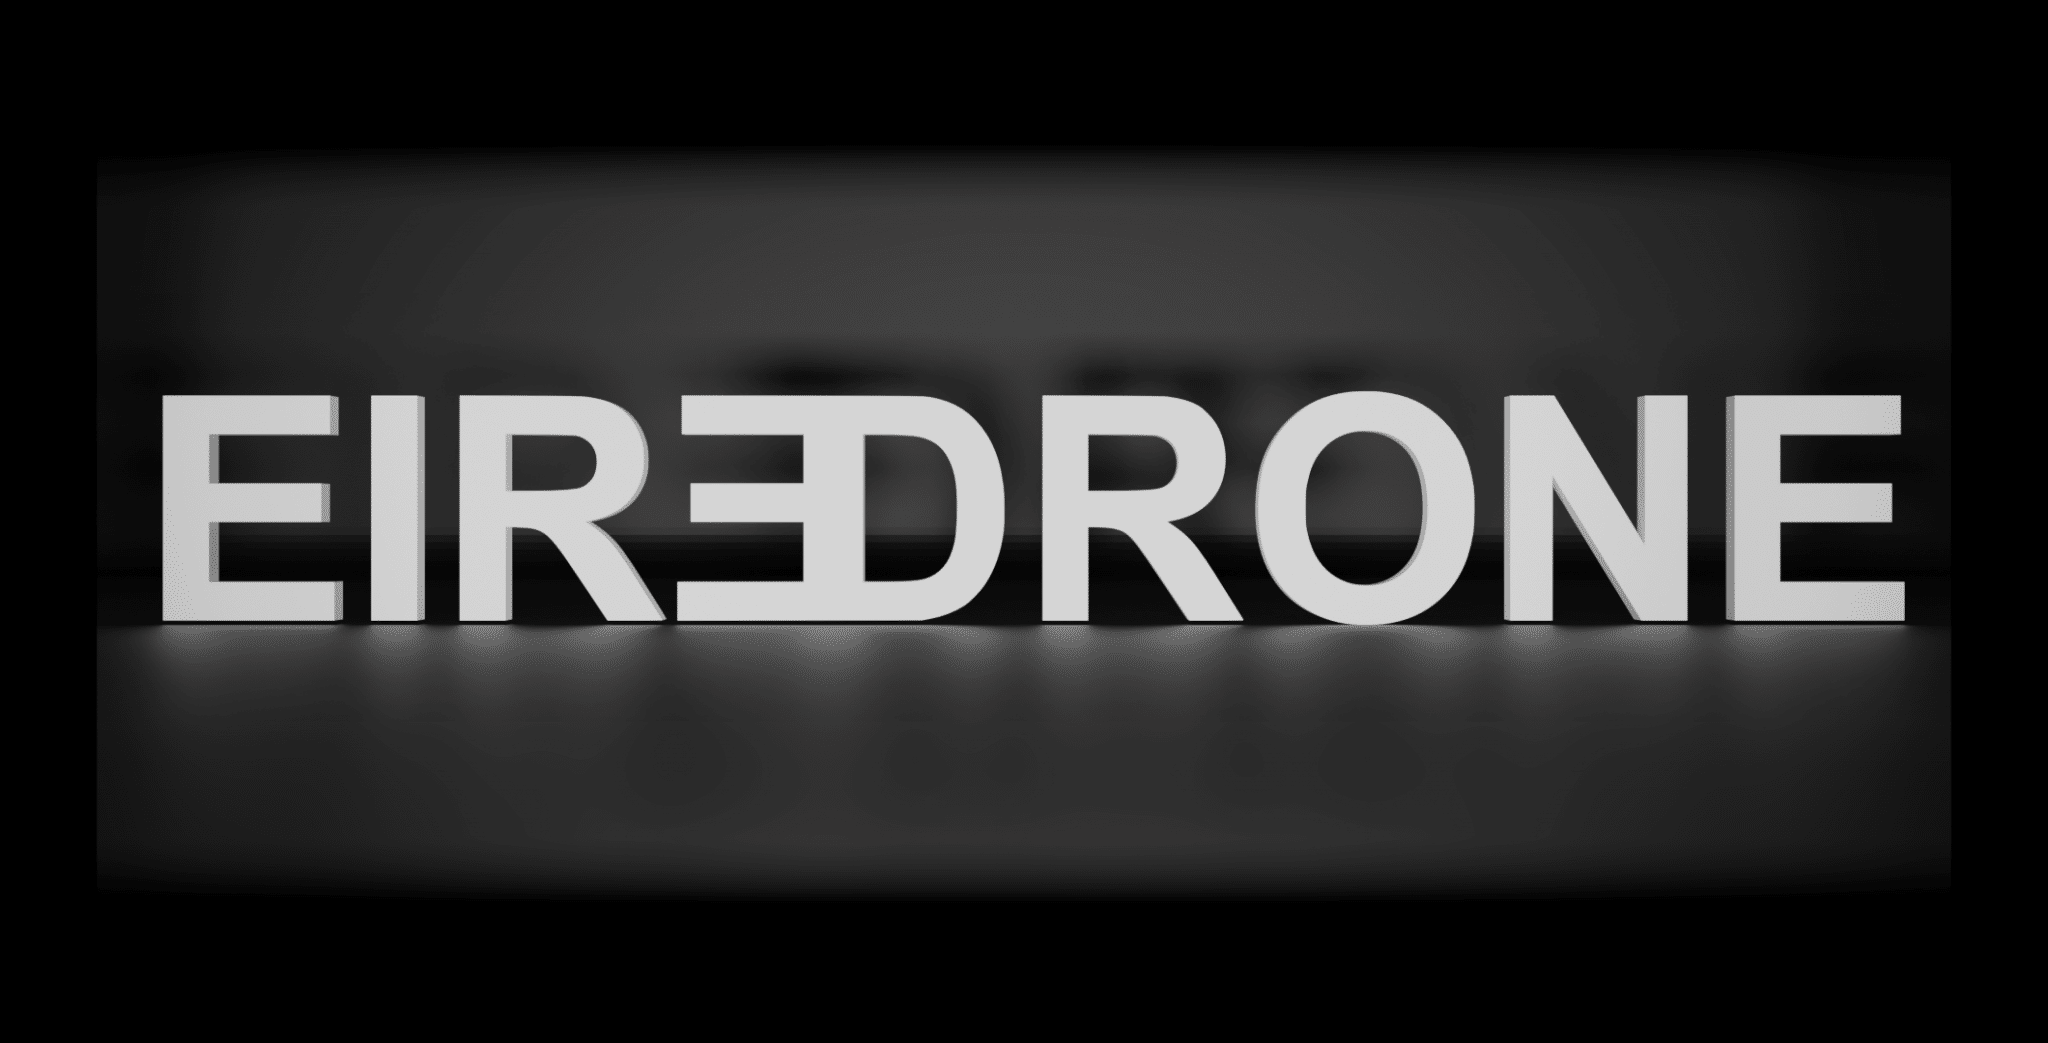 eiredrone